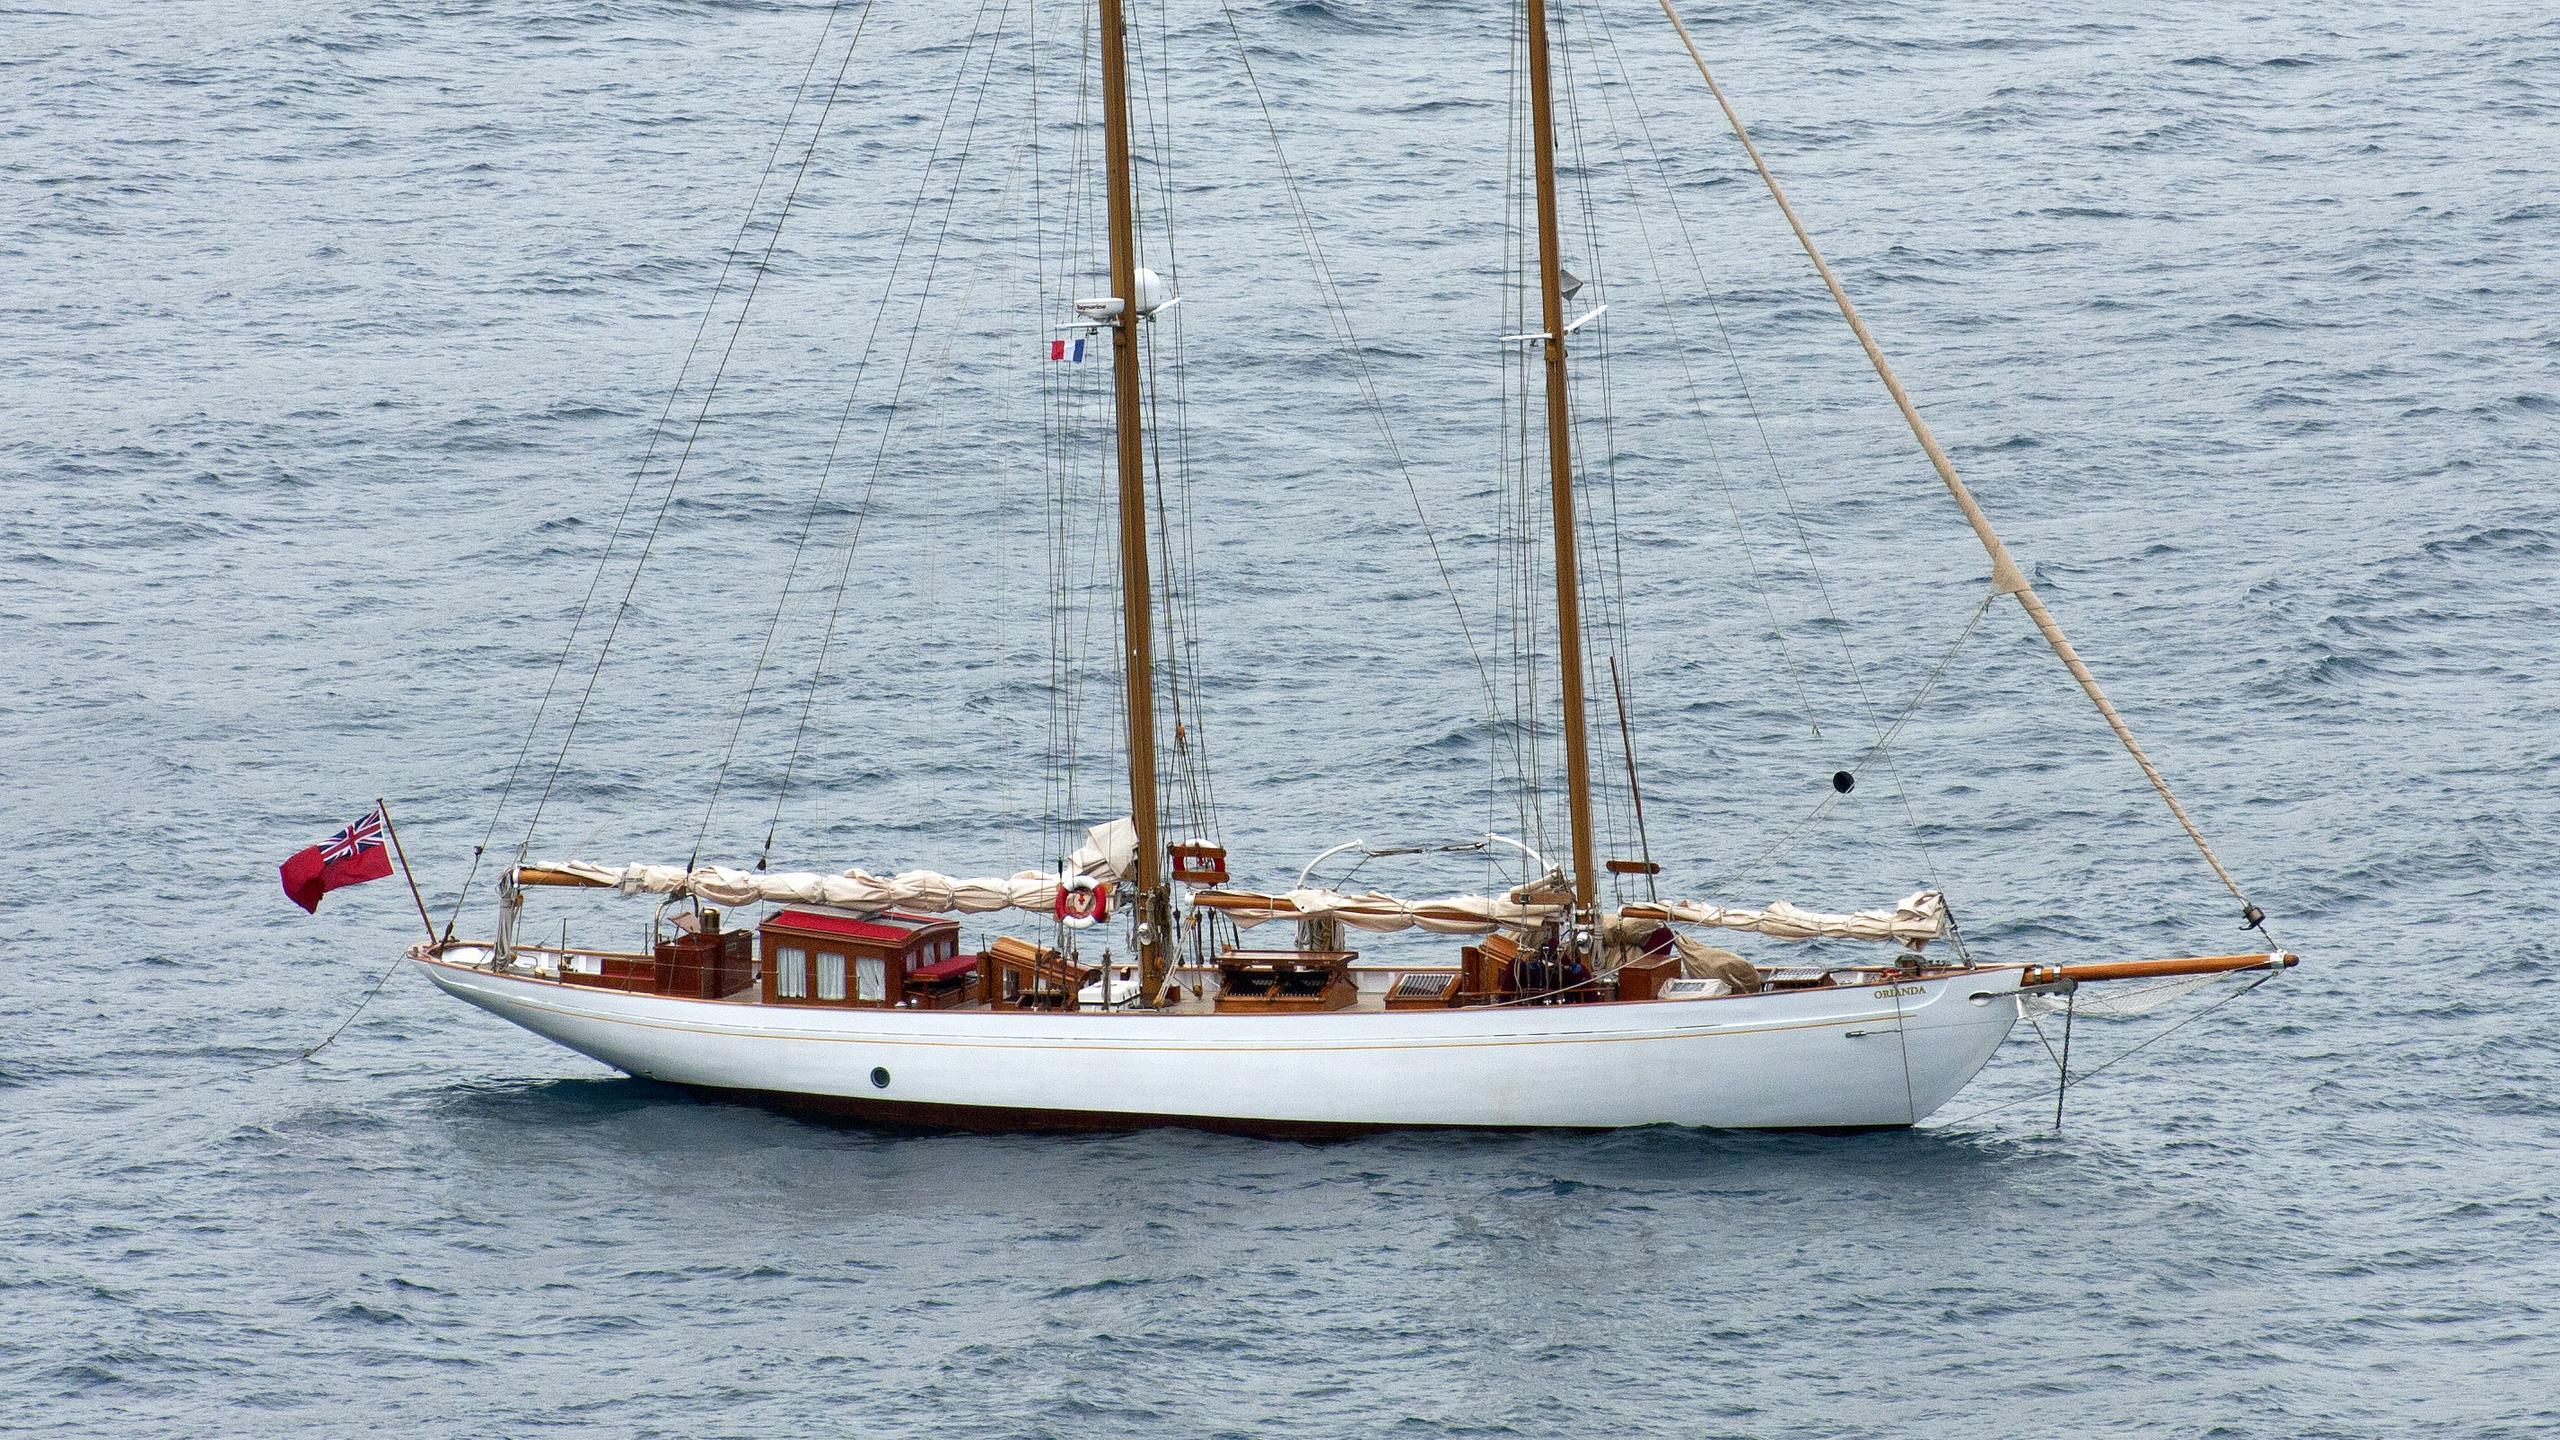 orianda-sailing-yacht-ring-andersen-1937-26m-profile